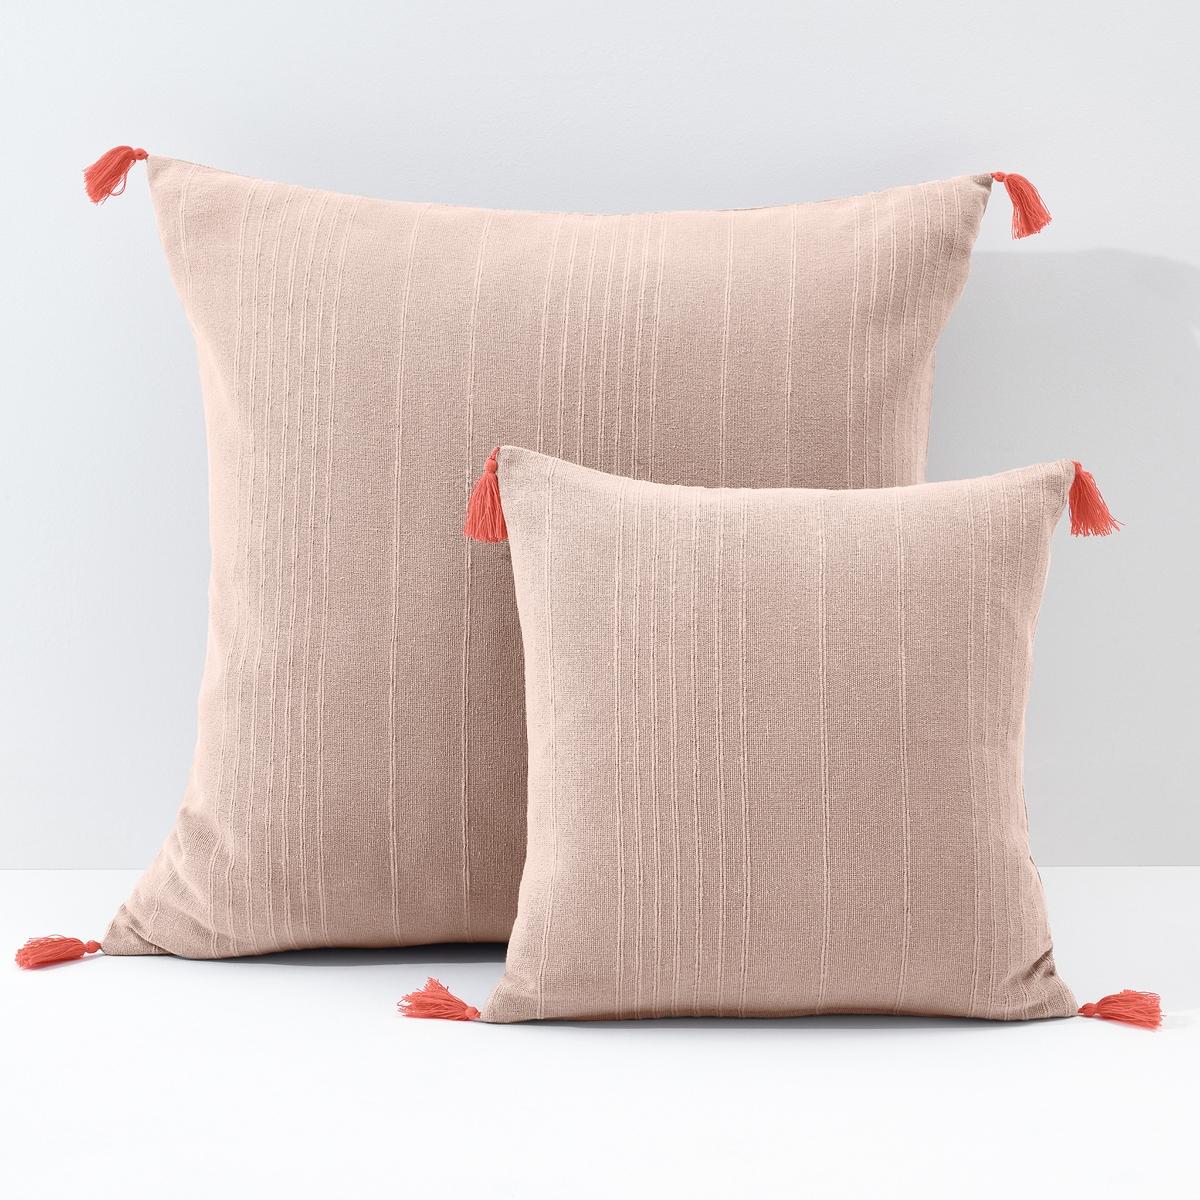 Чехол La Redoute Для подушки или наволочка однотонного цвета с помпонами RIAD 65 x 65 см розовый подушки